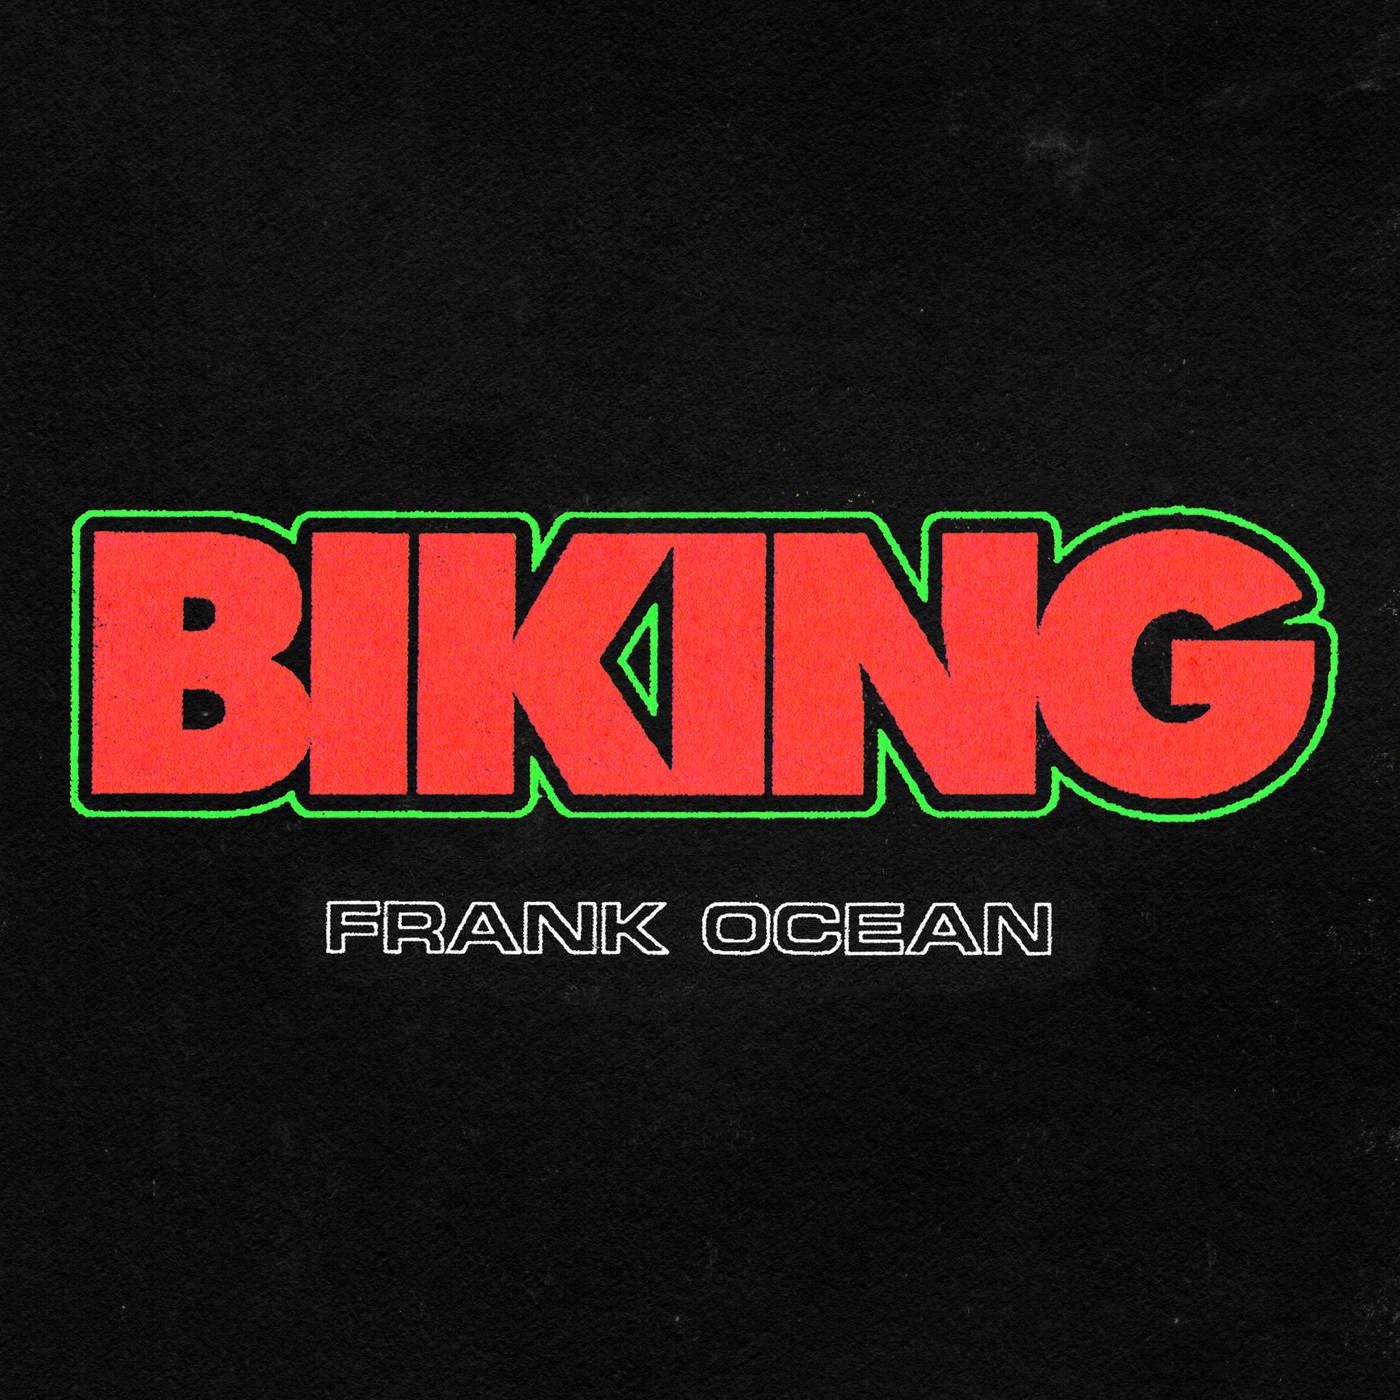 Biking - Single 2.png